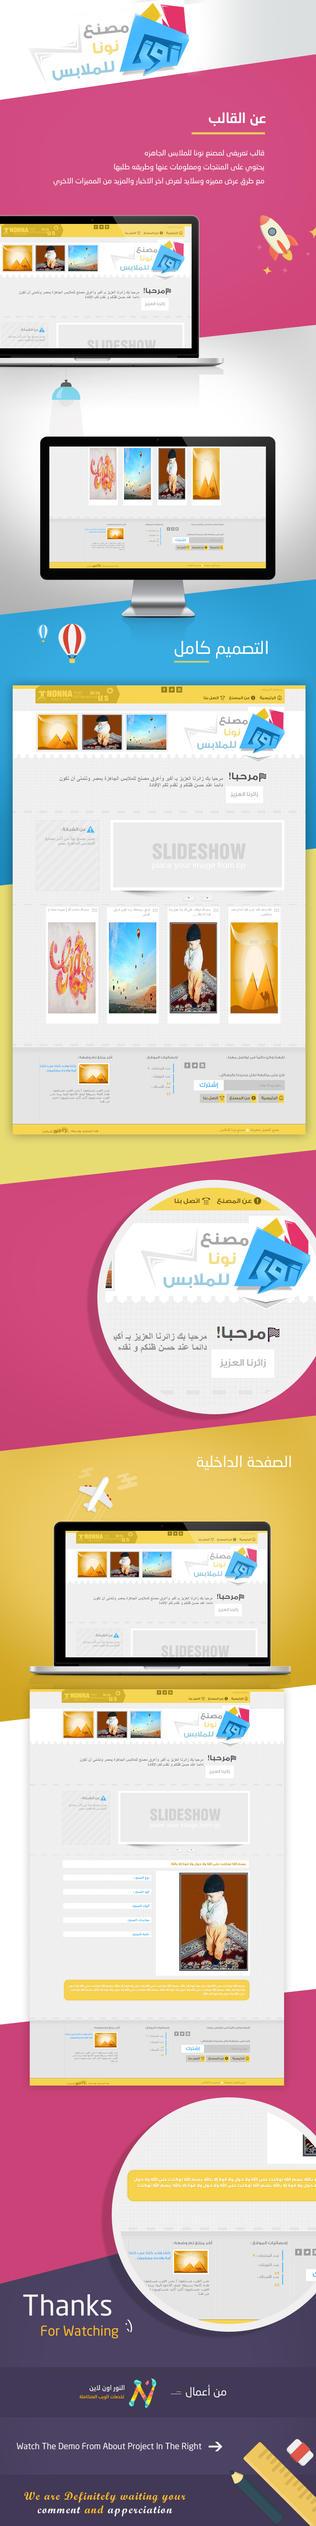 Nona Factory Wordpress Corporate by ElNoorOnline